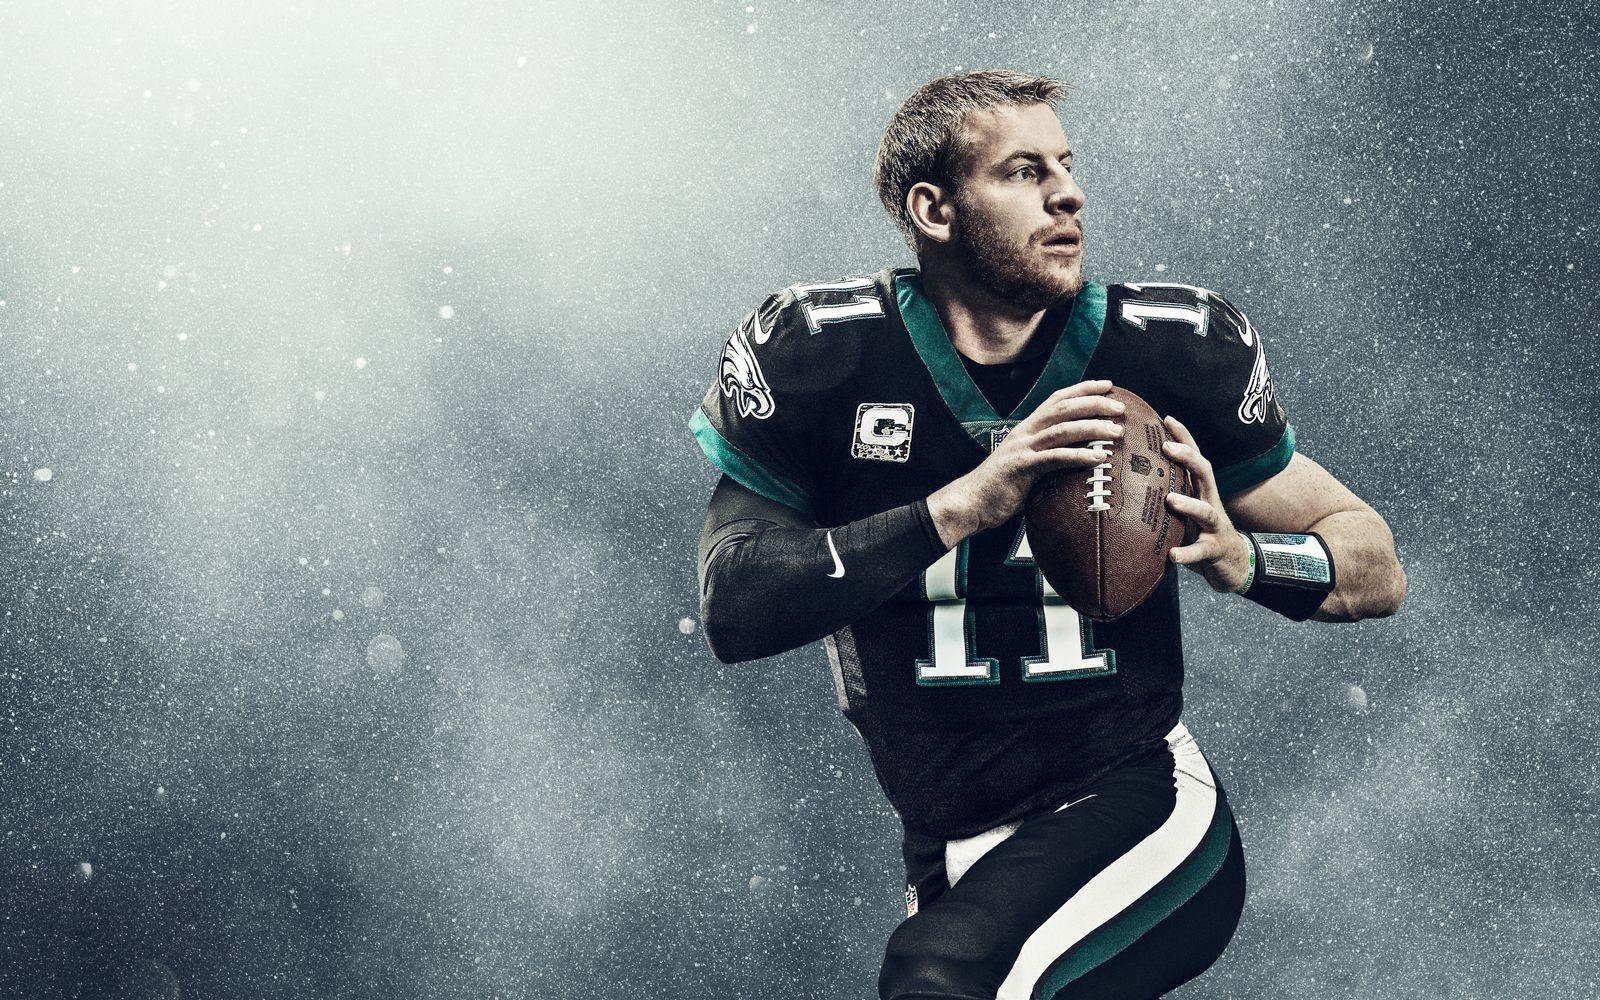 cheaper e76ee 942a2 Philadelphia Eagles quarterback Carson Wentz has fans ...